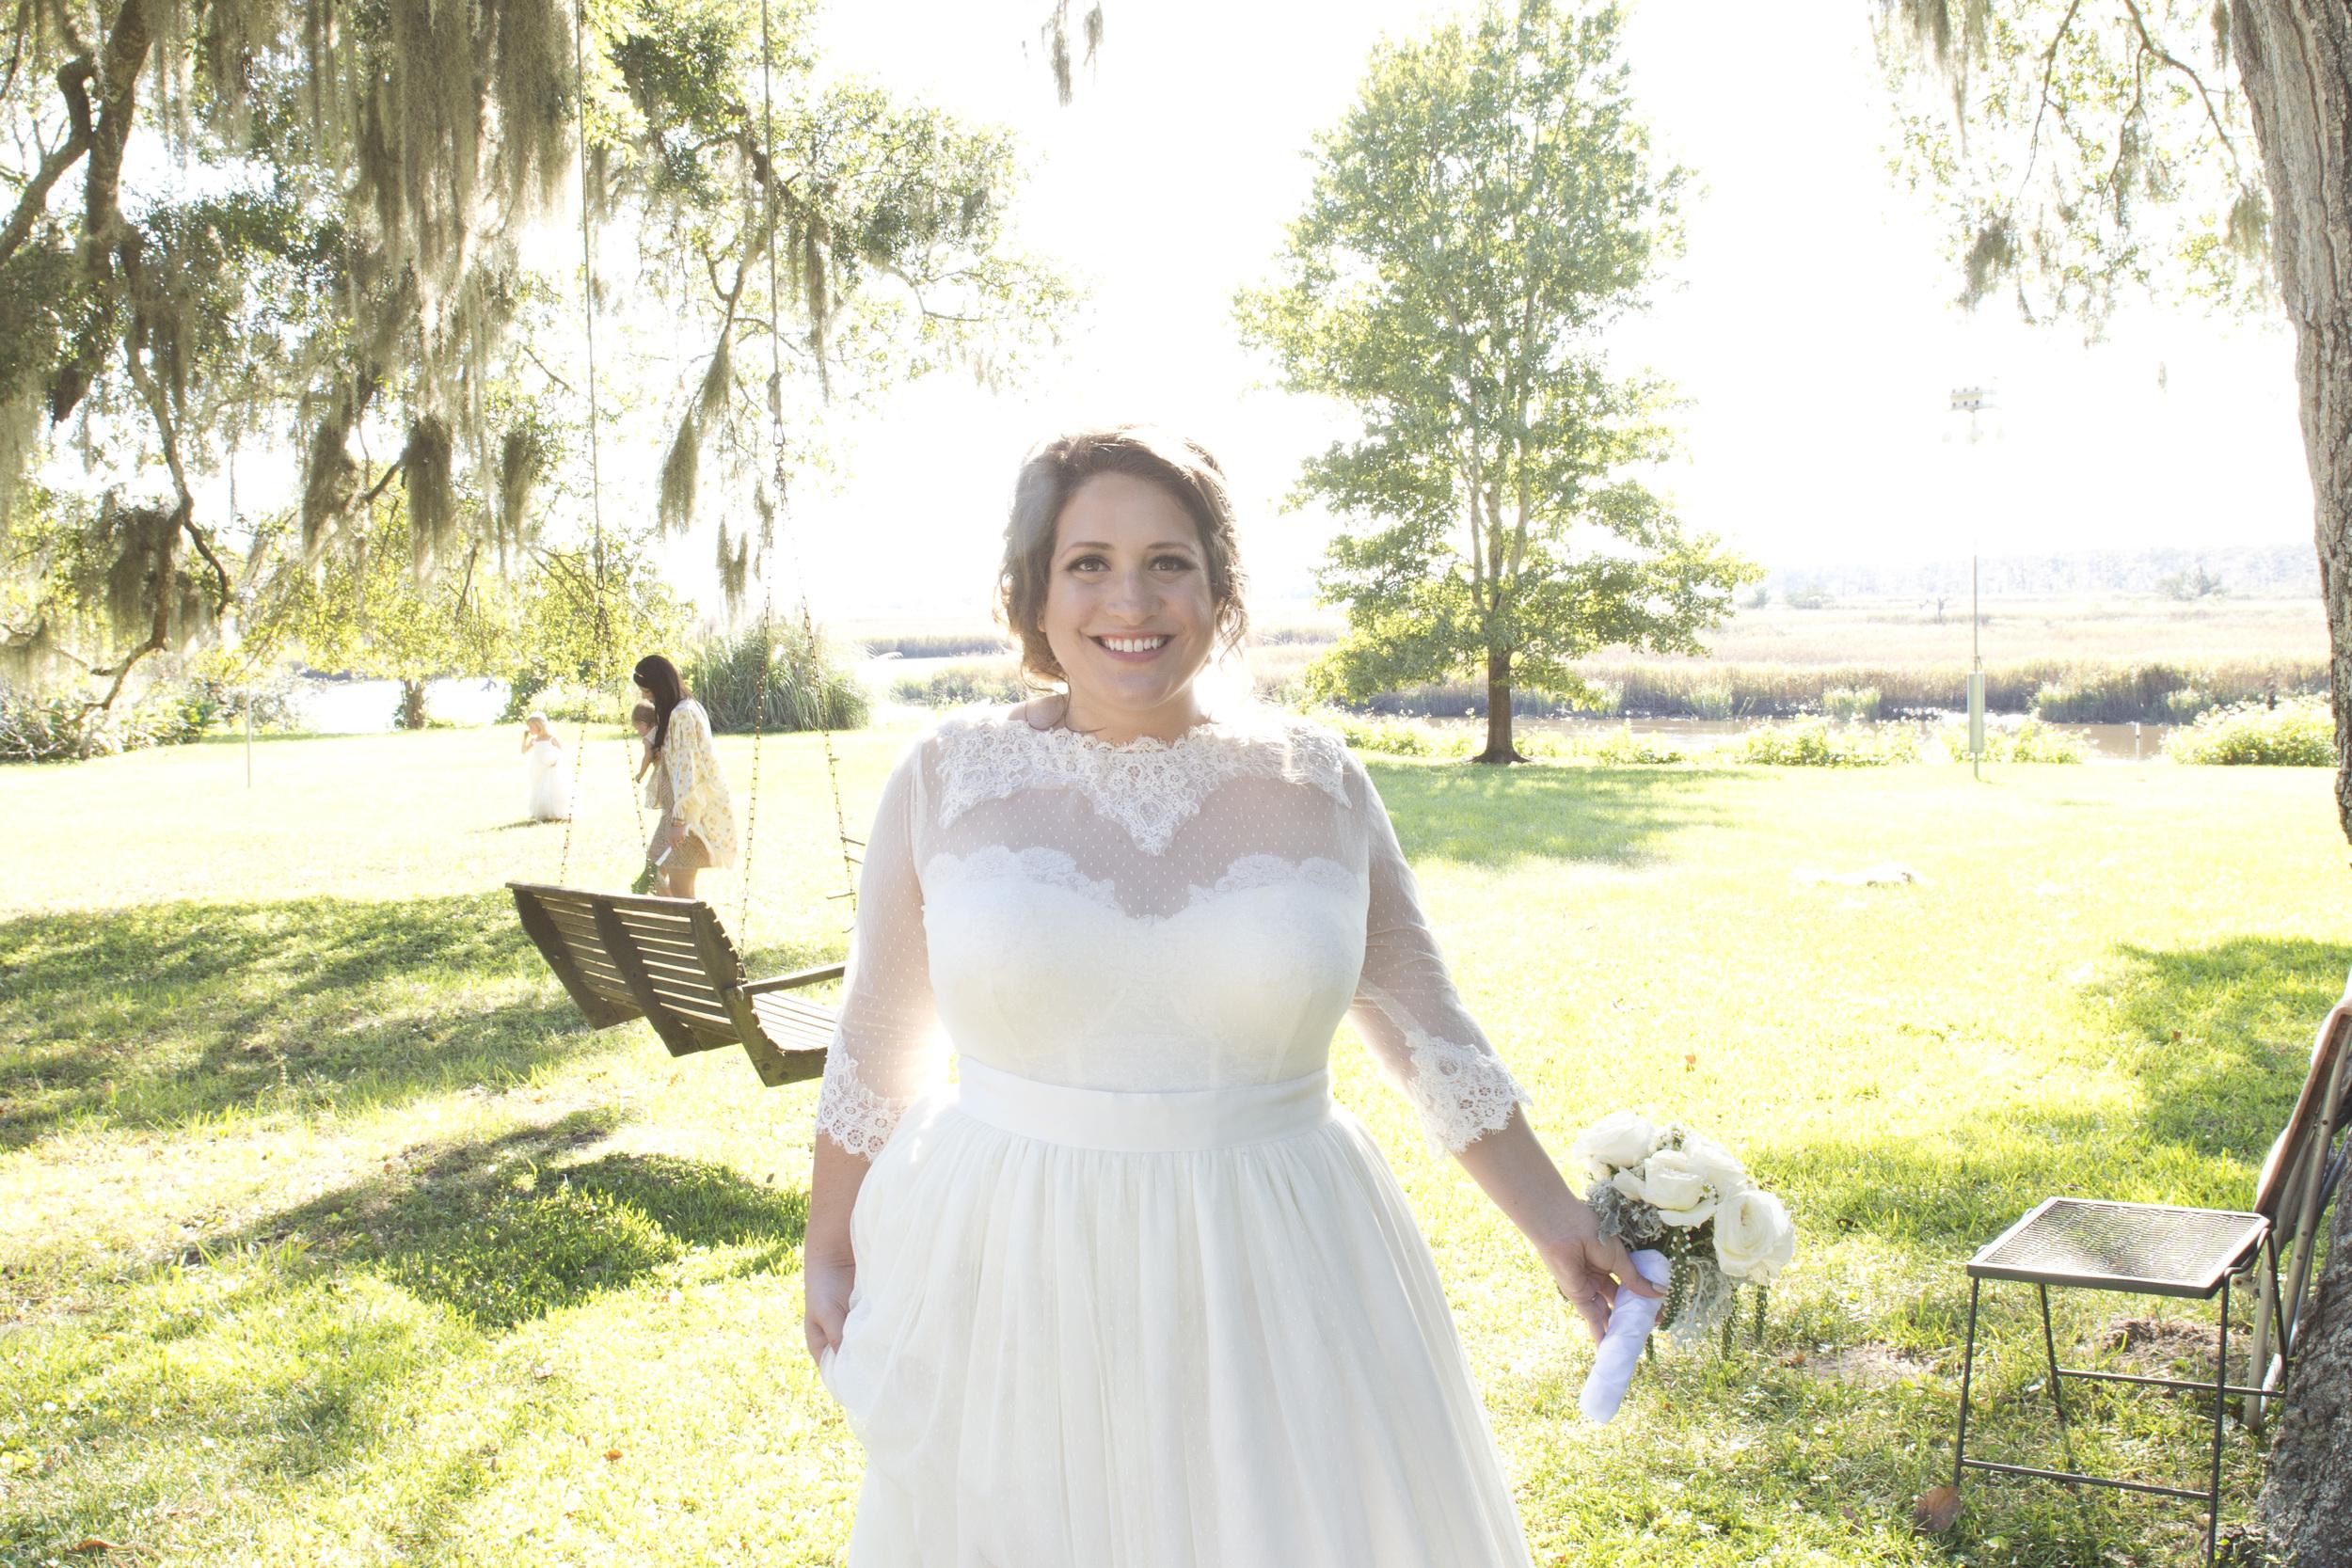 Caroline-Kilgore-photography-ivory-and-beau-bridal-boutique-savannah-wedding-dresses-savannah-bridal-boutique-savannah-wedding-gowns-custom-wedding-dress-vintage-wedding-dress-swiss-dot-wedding-dress-shrimp-boat-wedding-1.jpg